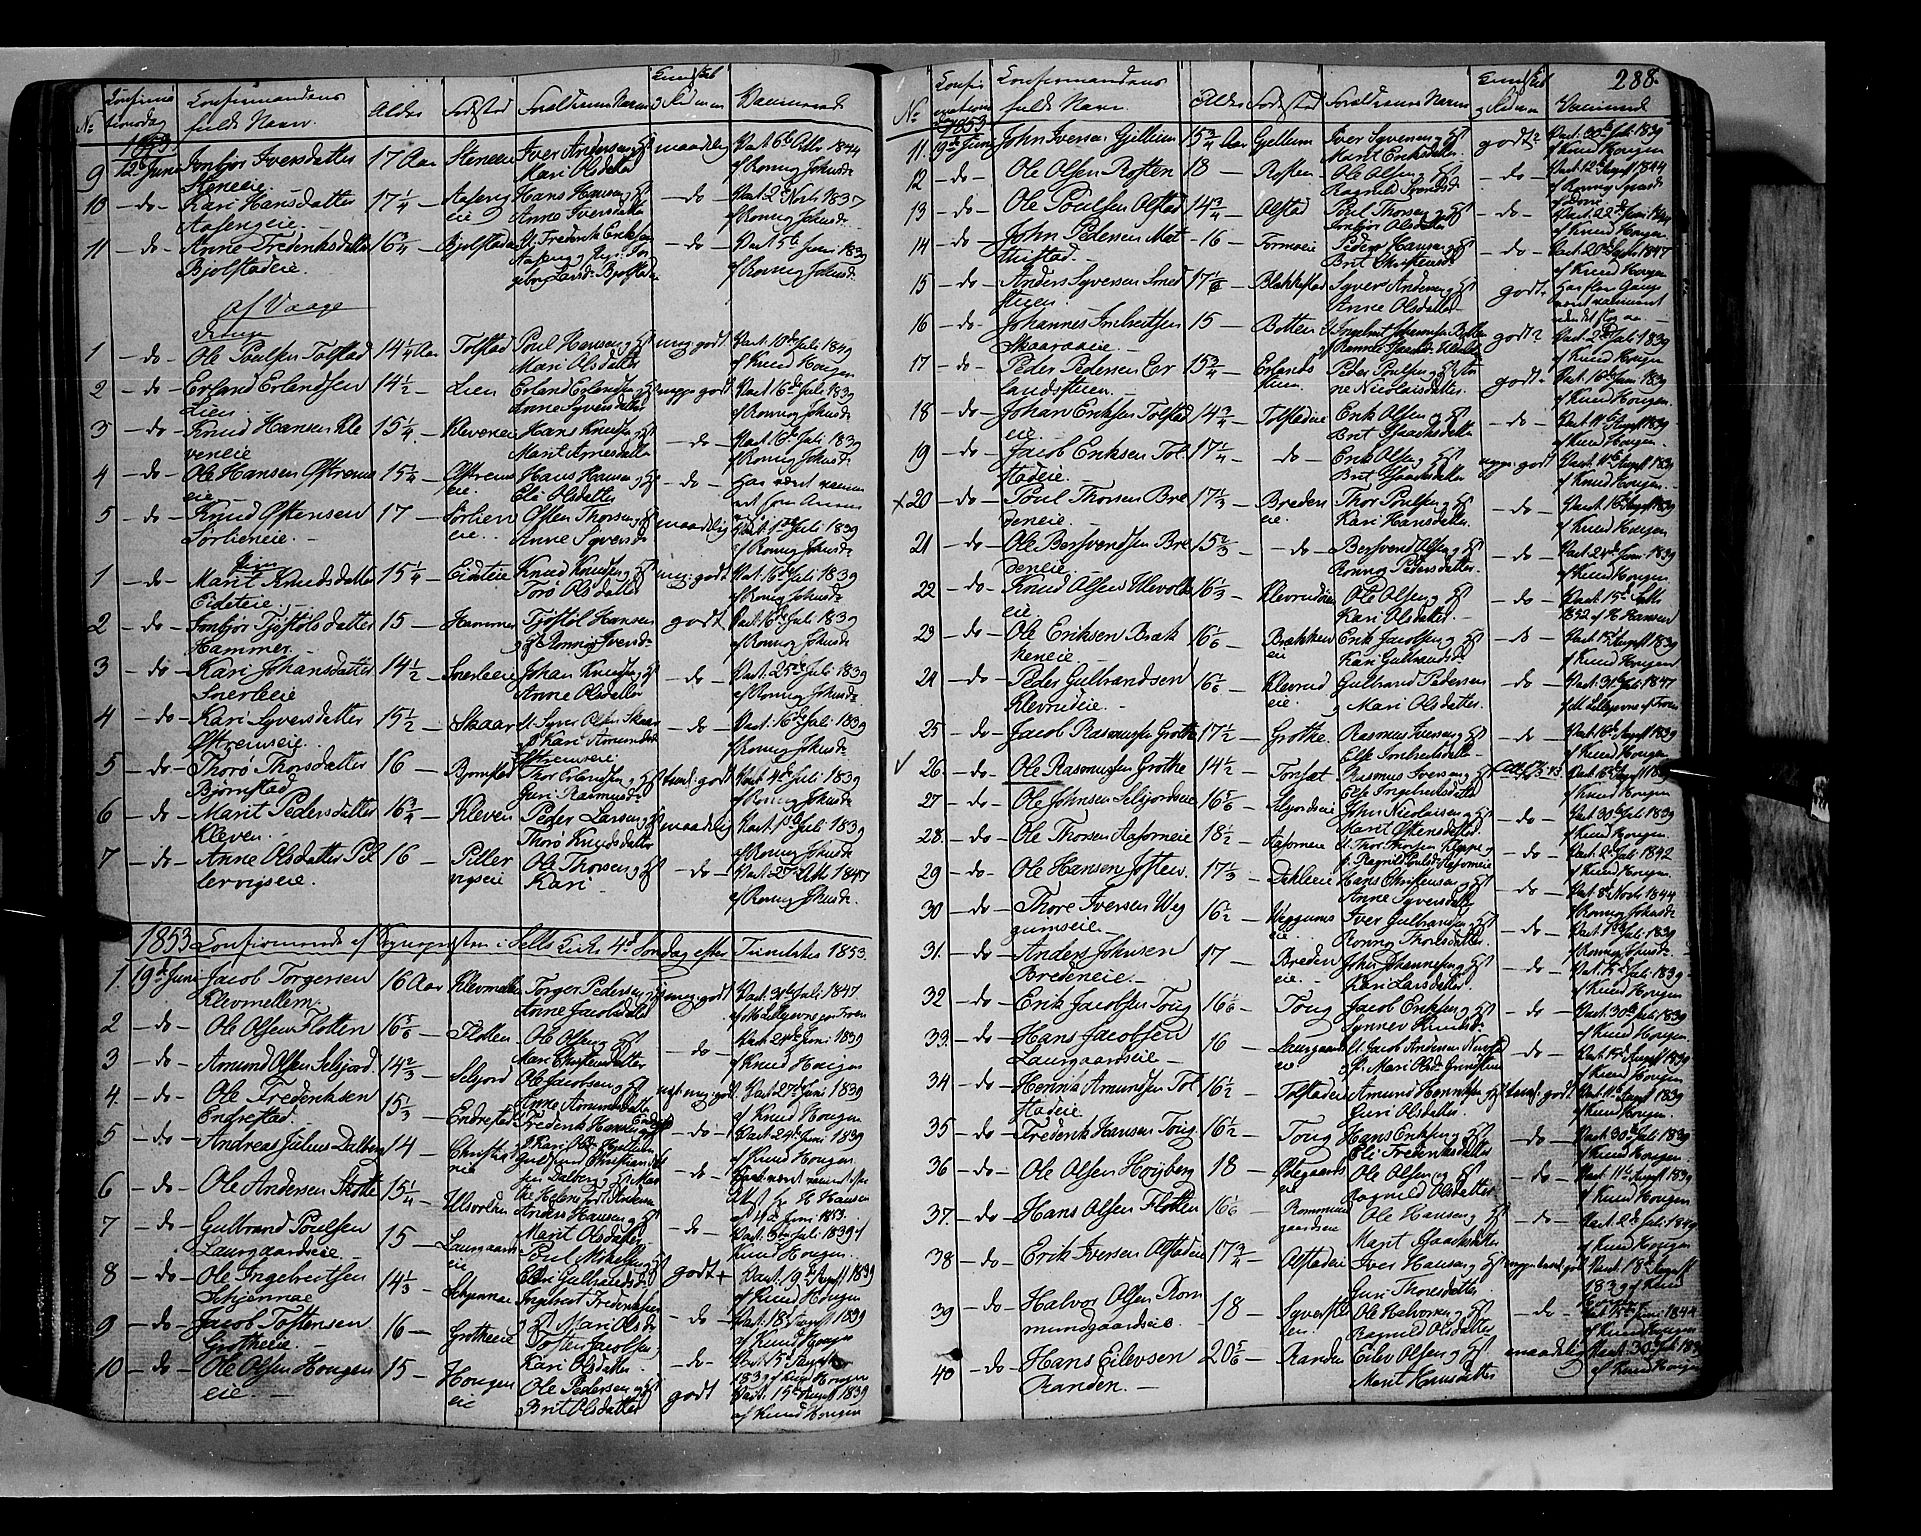 SAH, Vågå prestekontor, Ministerialbok nr. 5 /1, 1842-1856, s. 288